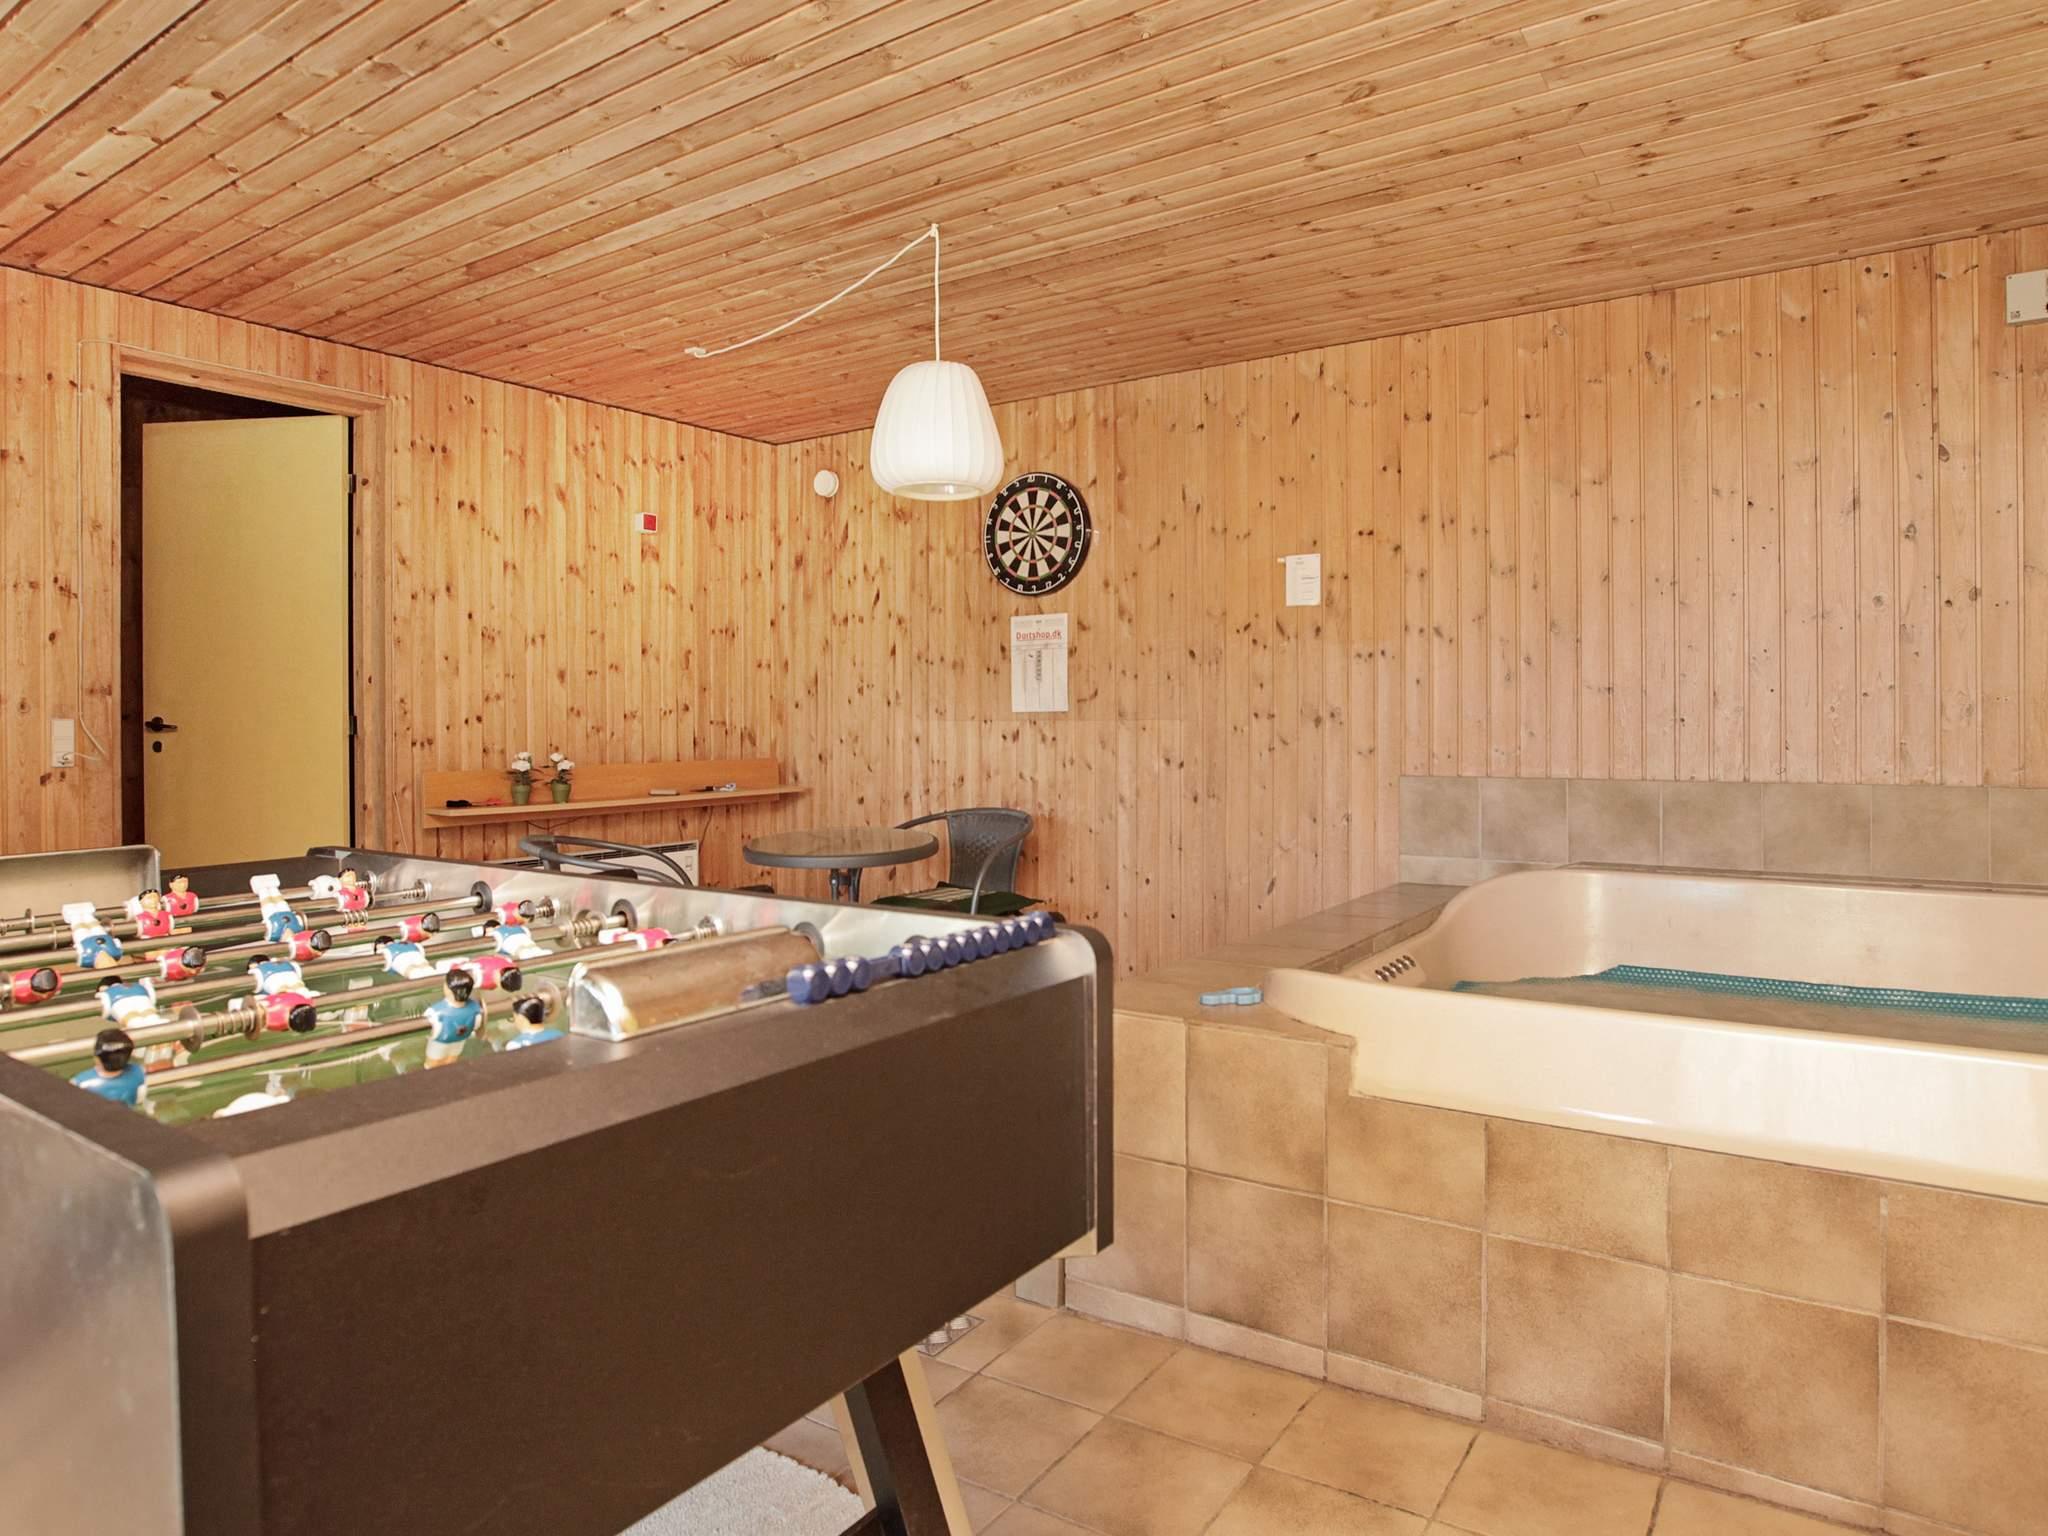 Ferienhaus Blåvand (93136), Blåvand, , Westjütland, Dänemark, Bild 13